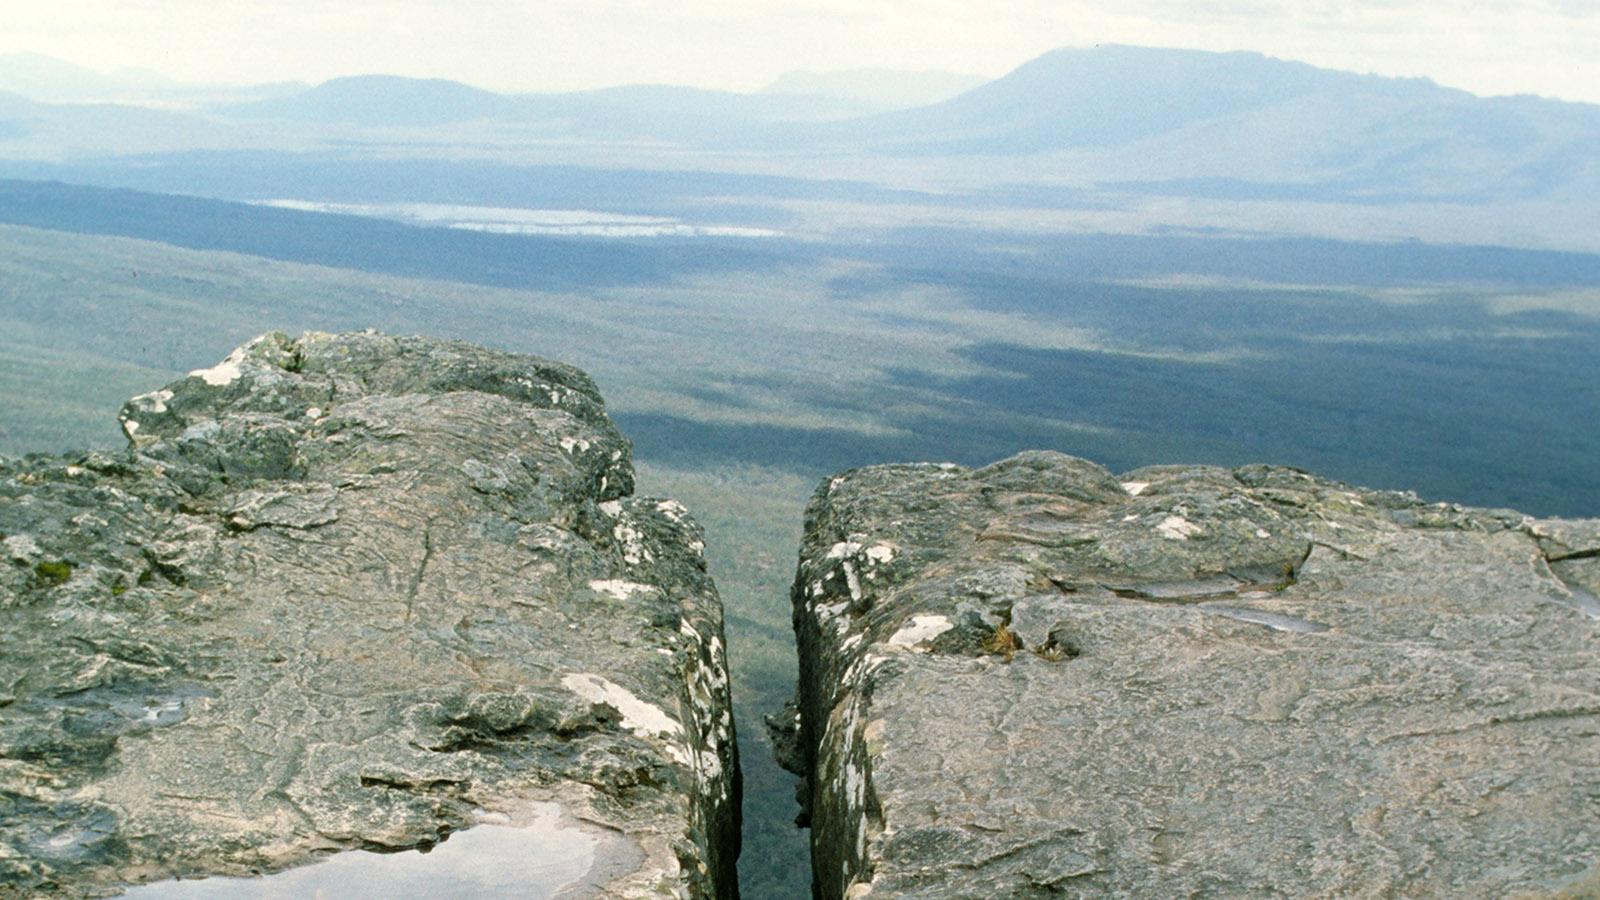 Blick von The Balconies ins Tal. Foto: Hilke Maunder